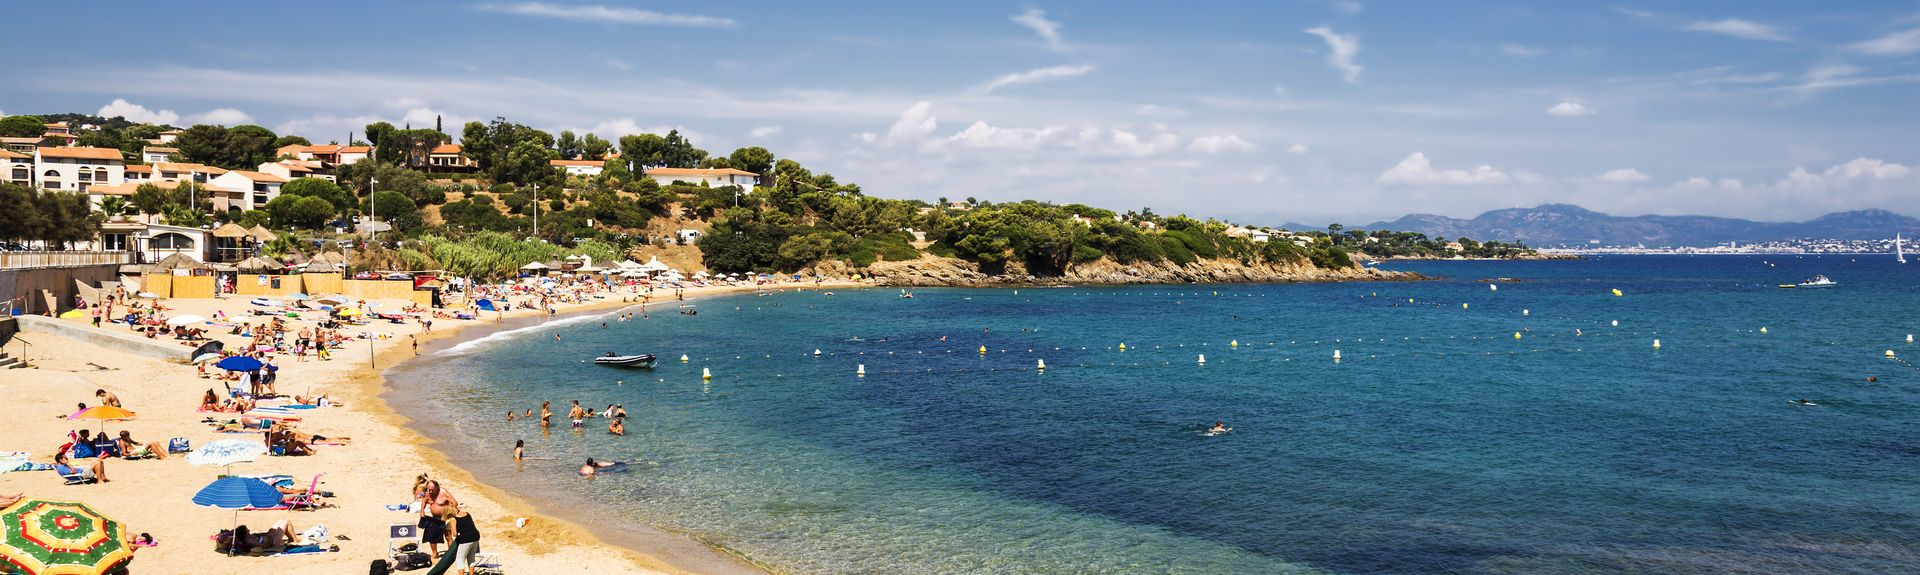 Saint-Aygulf, Fréjus, Provence-Alpes-Côte d'Azur, Frankreich